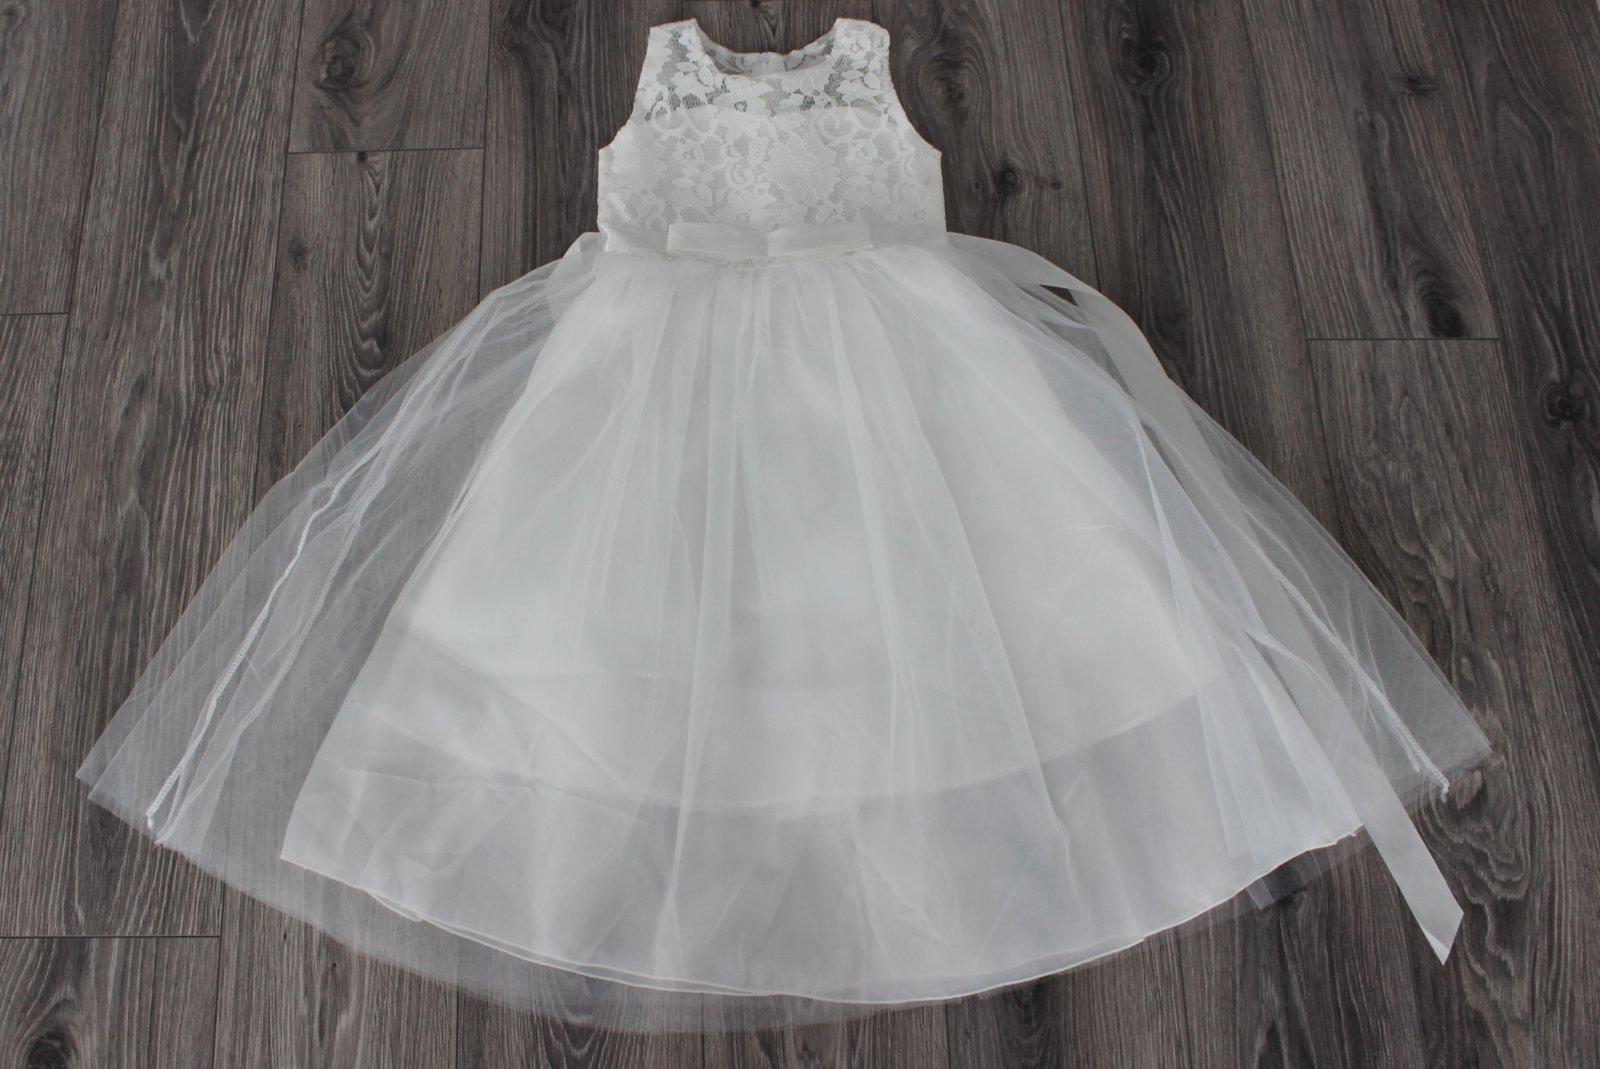 Dievčenské šaty veľ. 122/128 - Obrázok č. 1